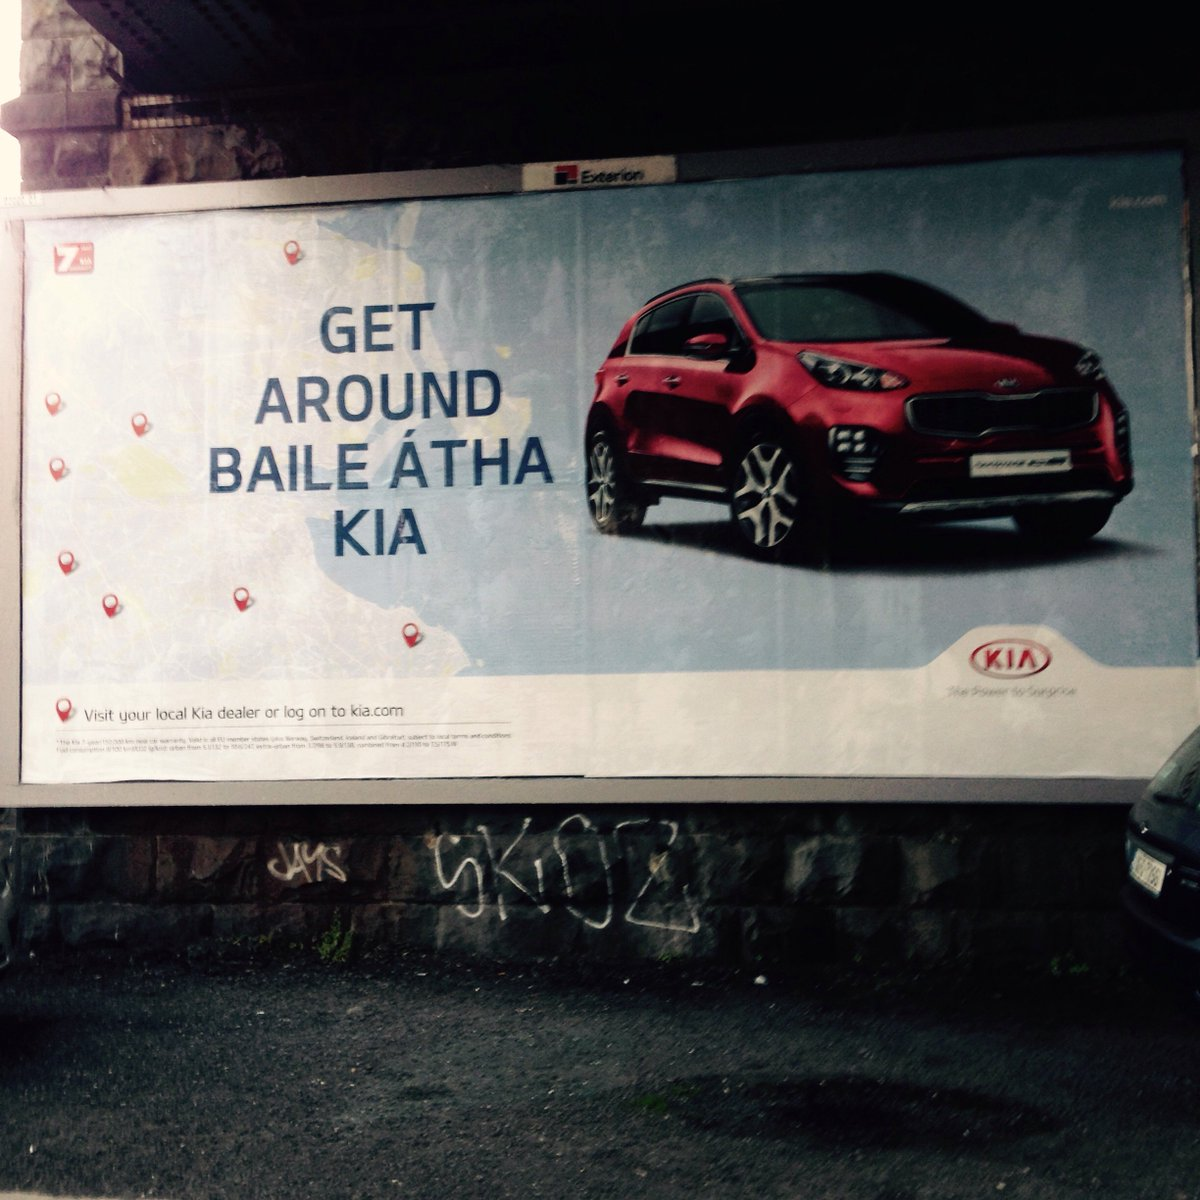 GO TOBANN!!!  I want a #KIA car  #GAEILGE #AnEuroGaelach #BÁC #KIAmotors<br>http://pic.twitter.com/g2lvMkPzZR